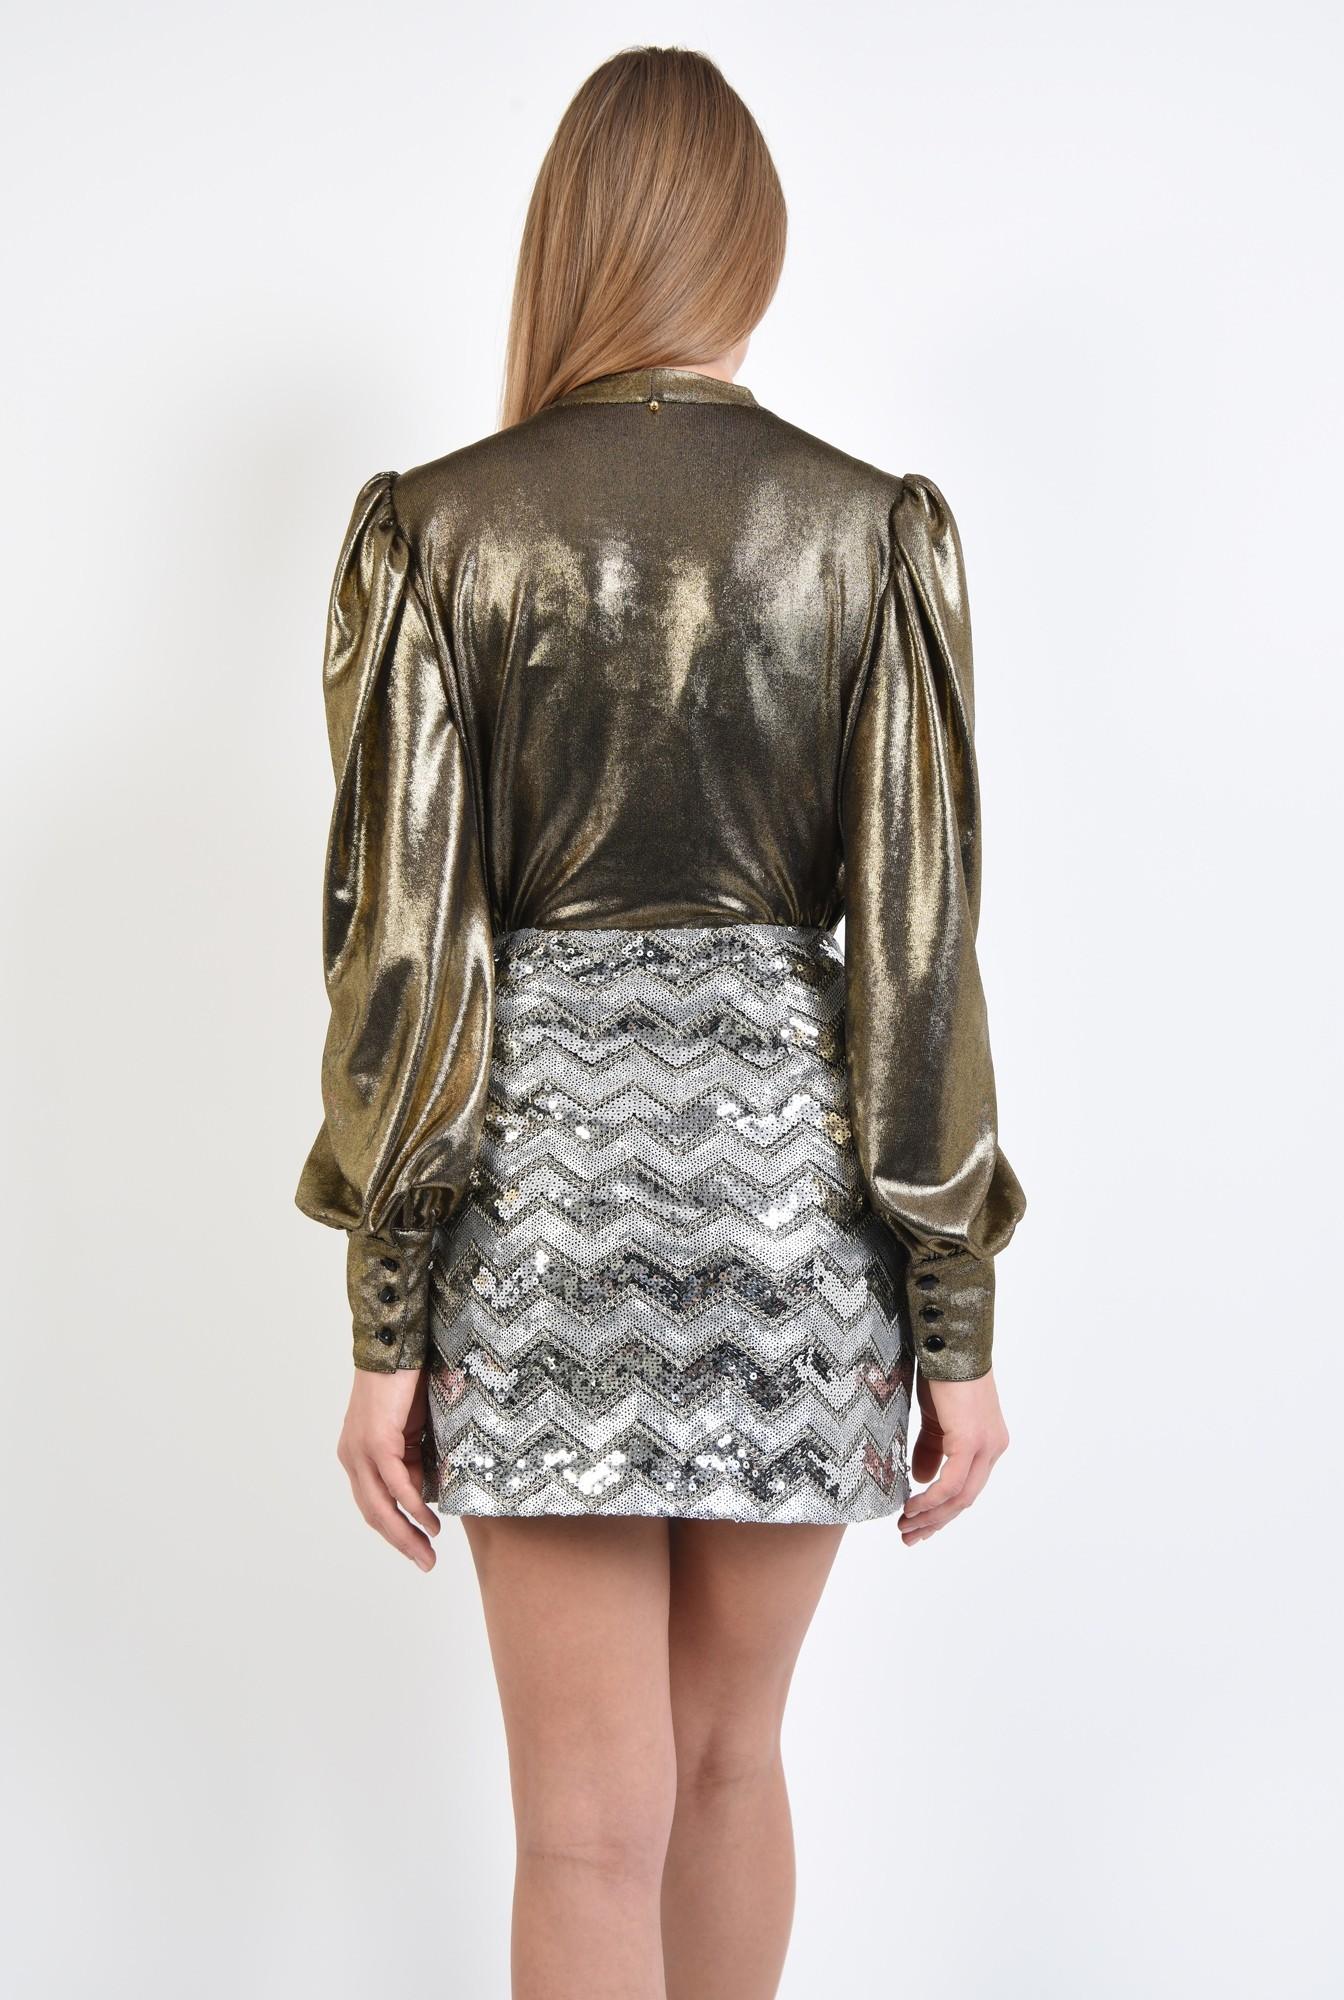 1 - fusta eleganta, paiete argintii, dungi chevron, scurta, croi drept